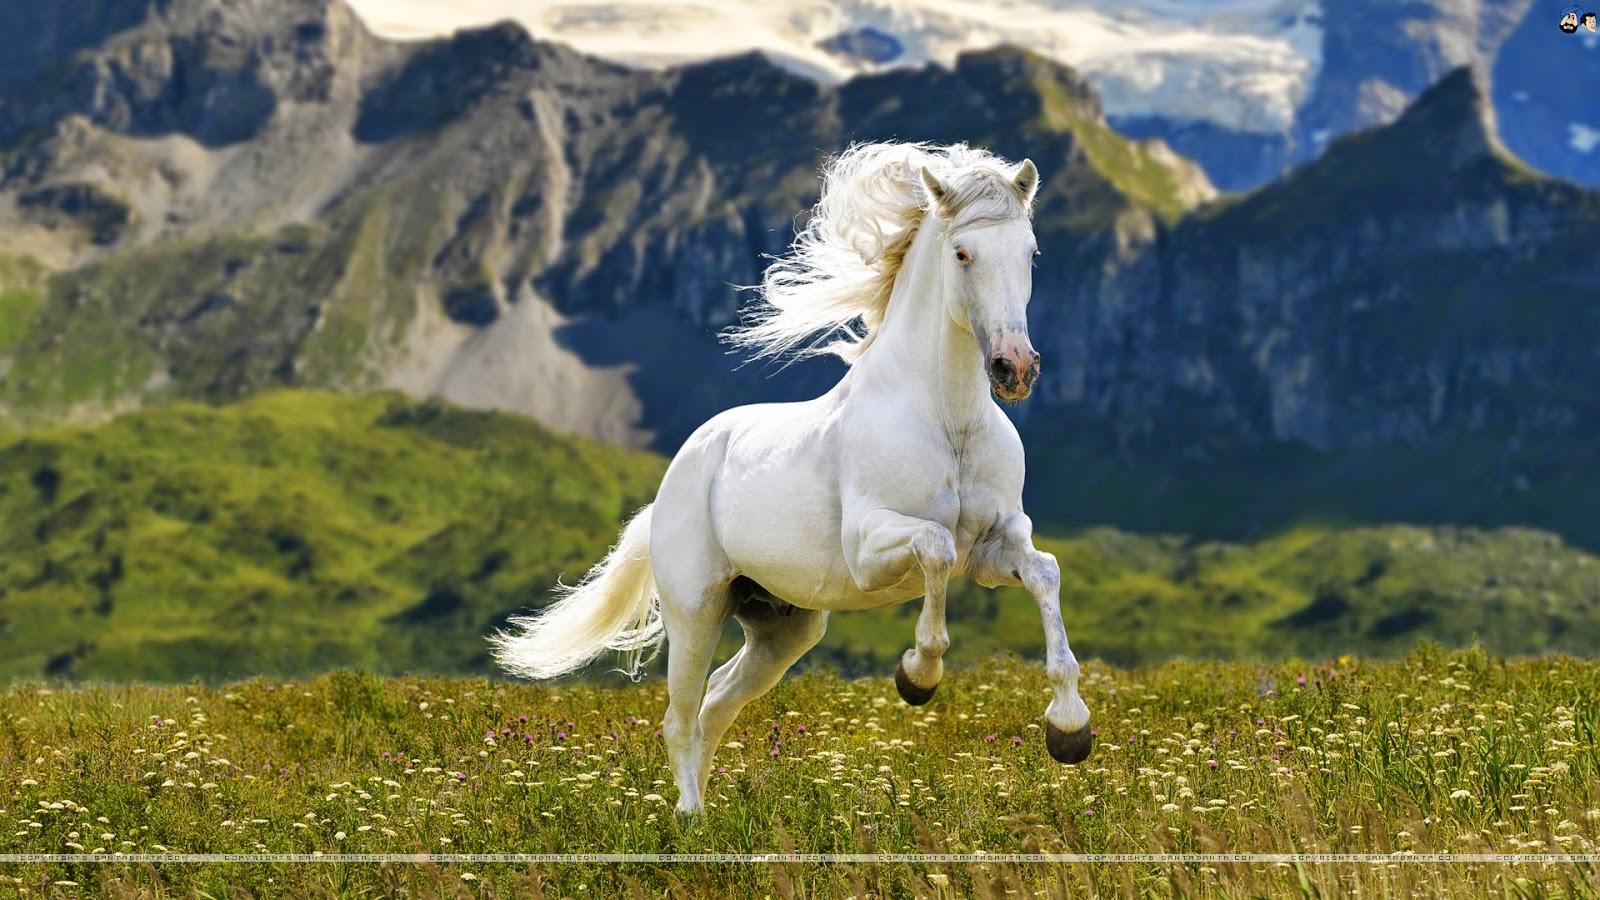 Great   Wallpaper Horse Creative - pretty-white-horse-wallpaper  Photograph_672210.jpg